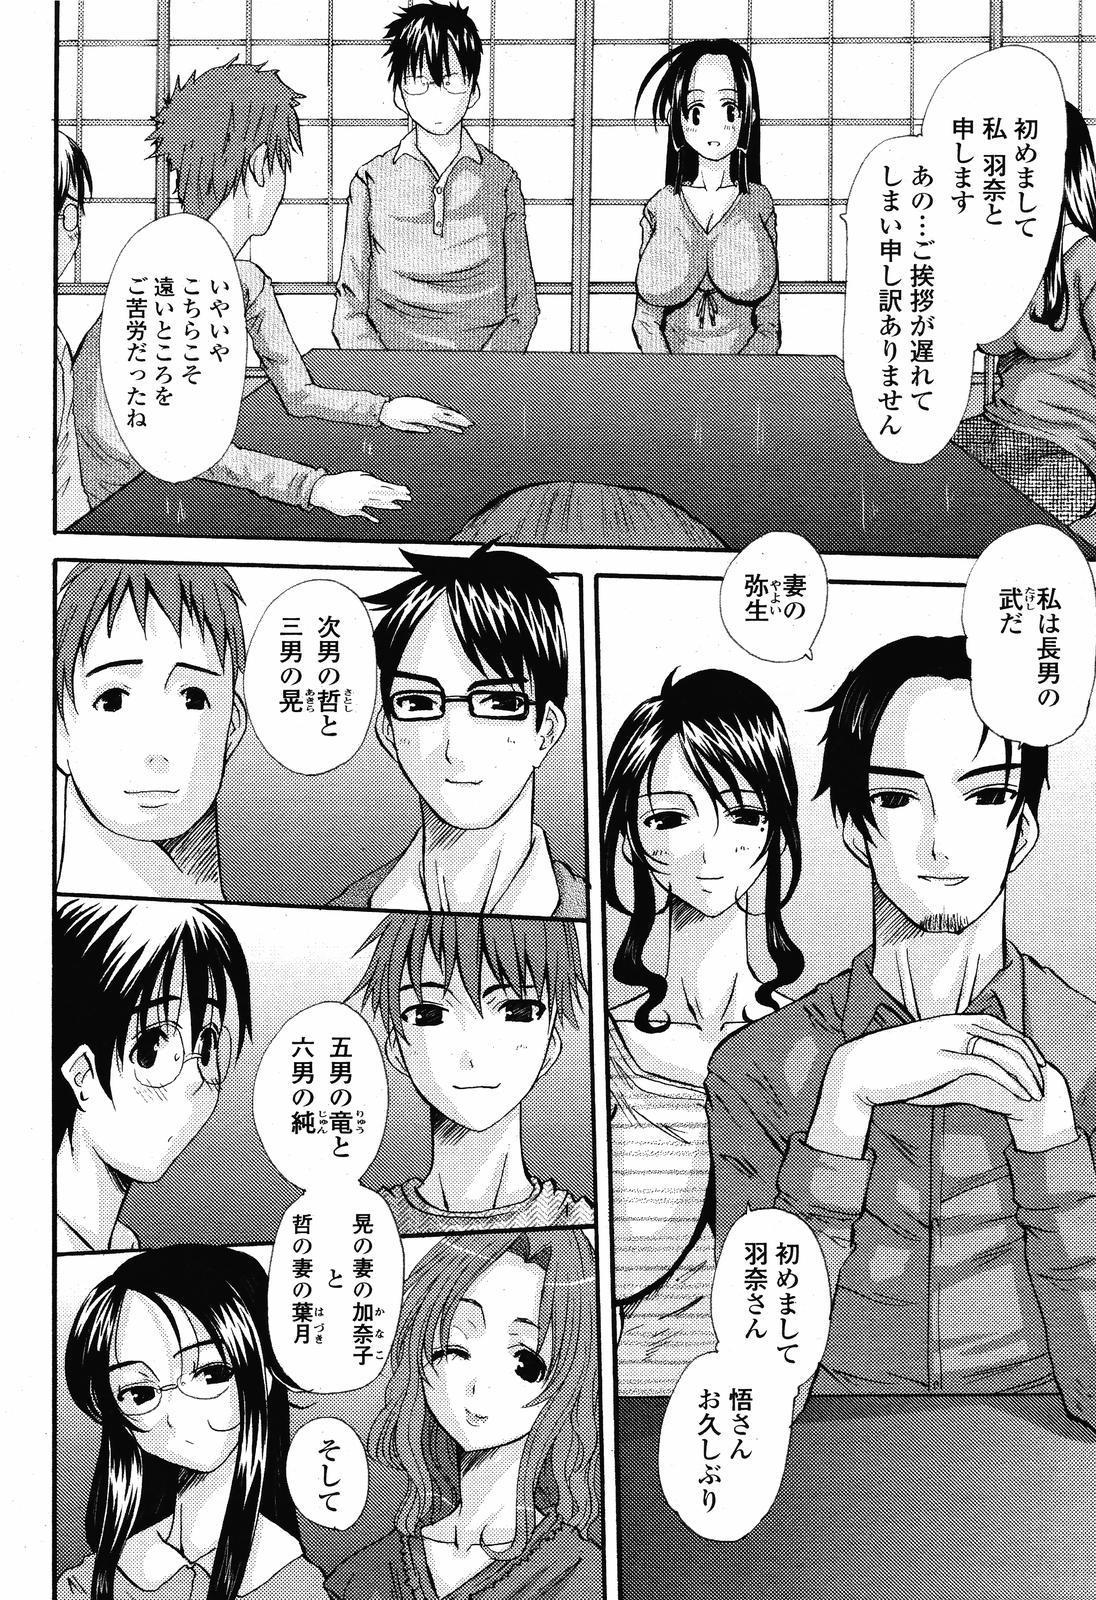 COMIC Momohime 2008-11 111